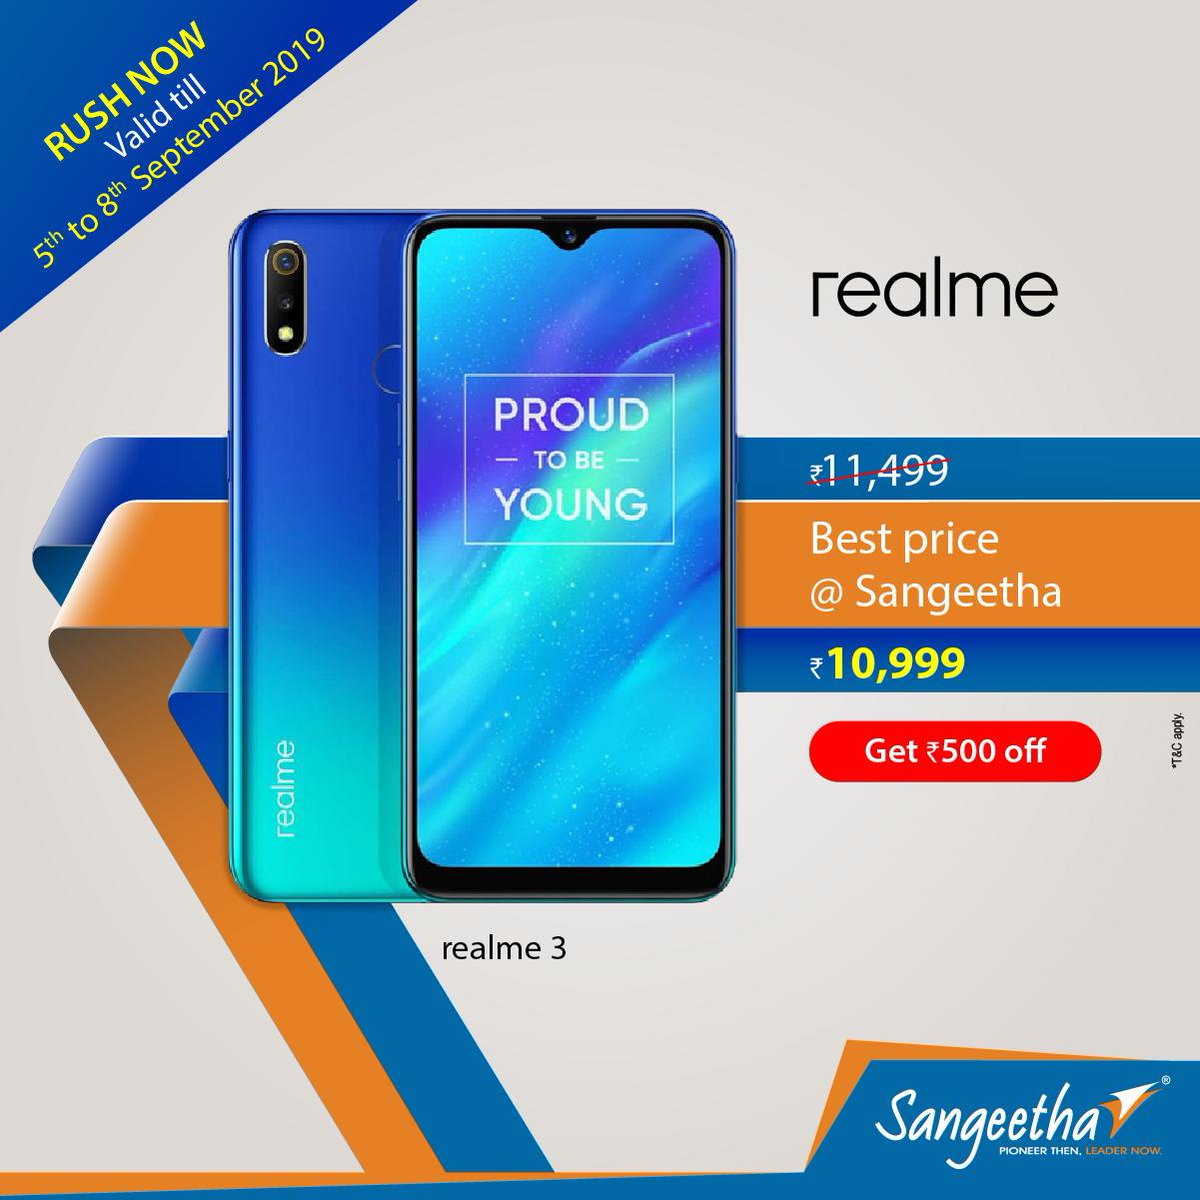 realme2pro hashtag on Twitter